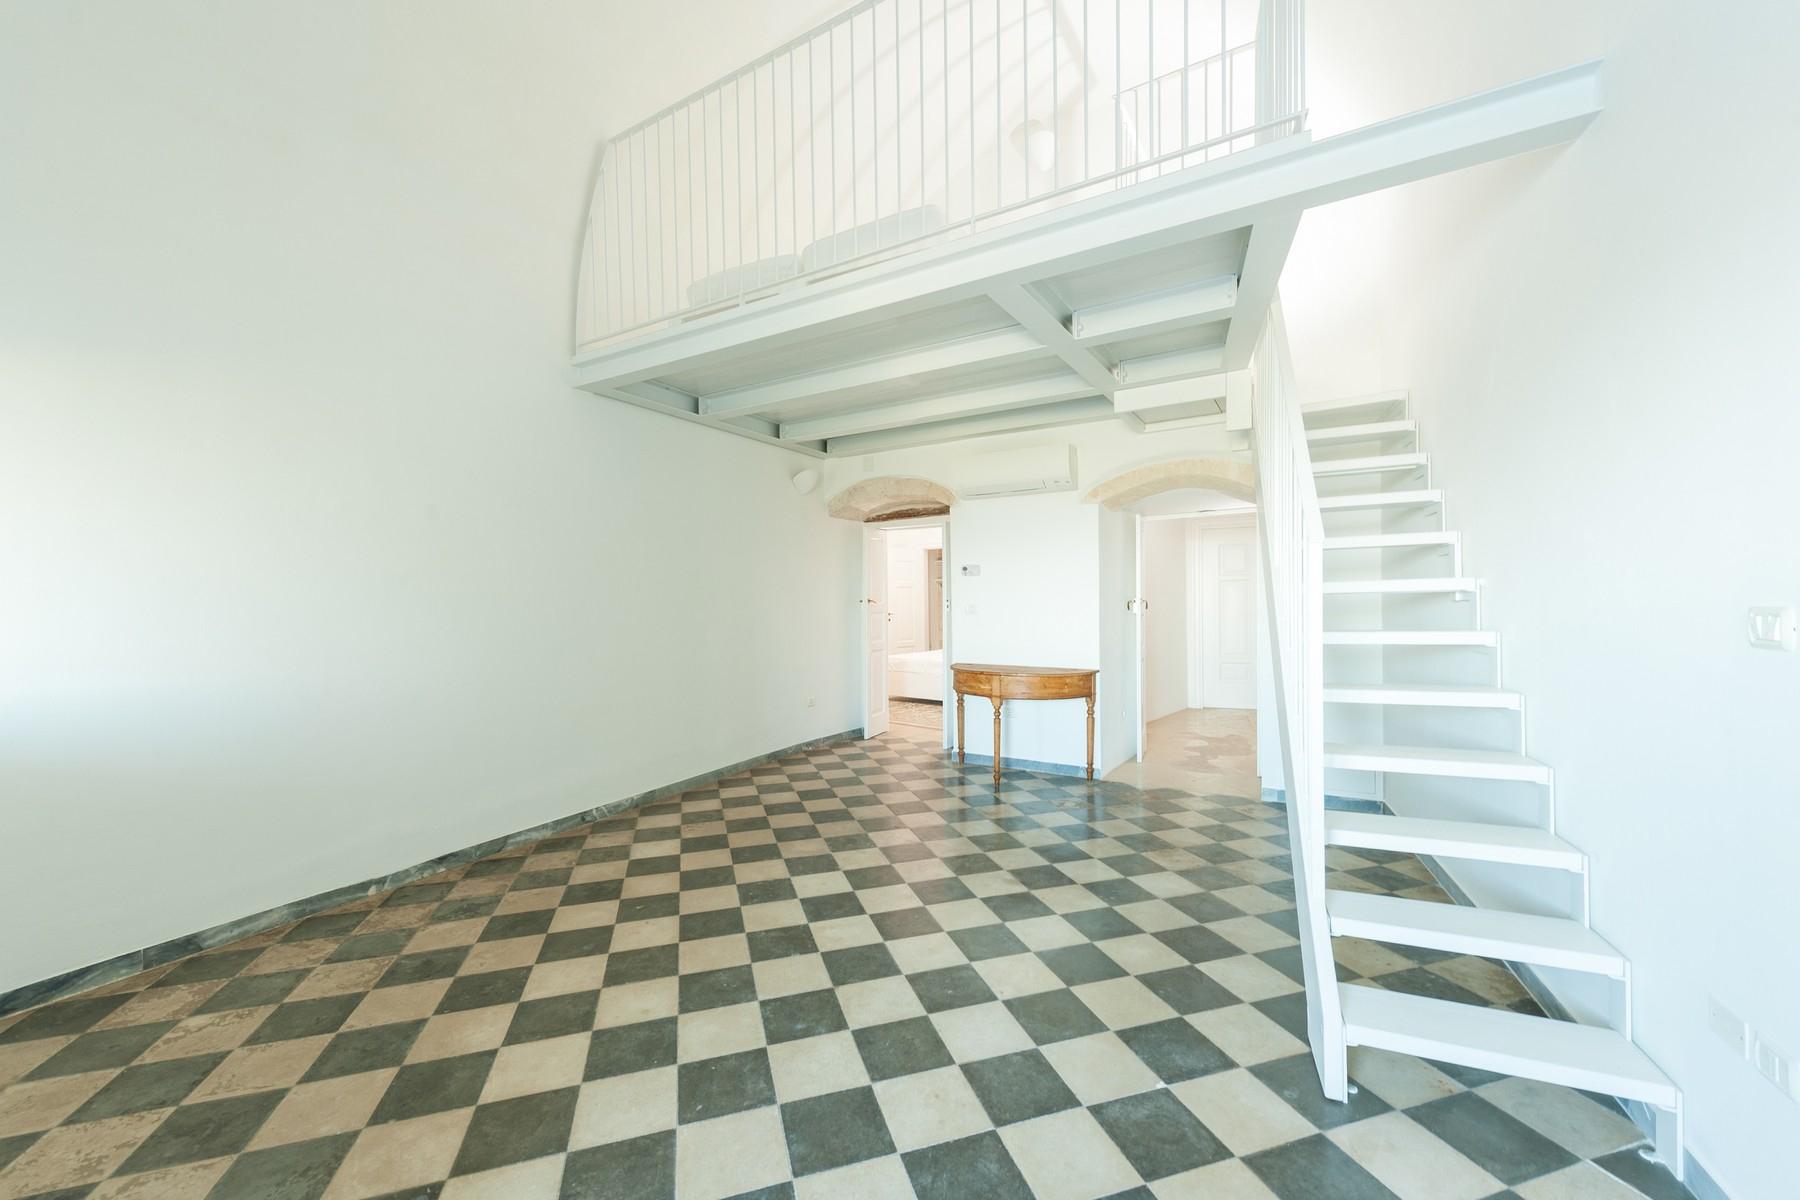 Appartamento in Vendita a Ostuni: 5 locali, 265 mq - Foto 22